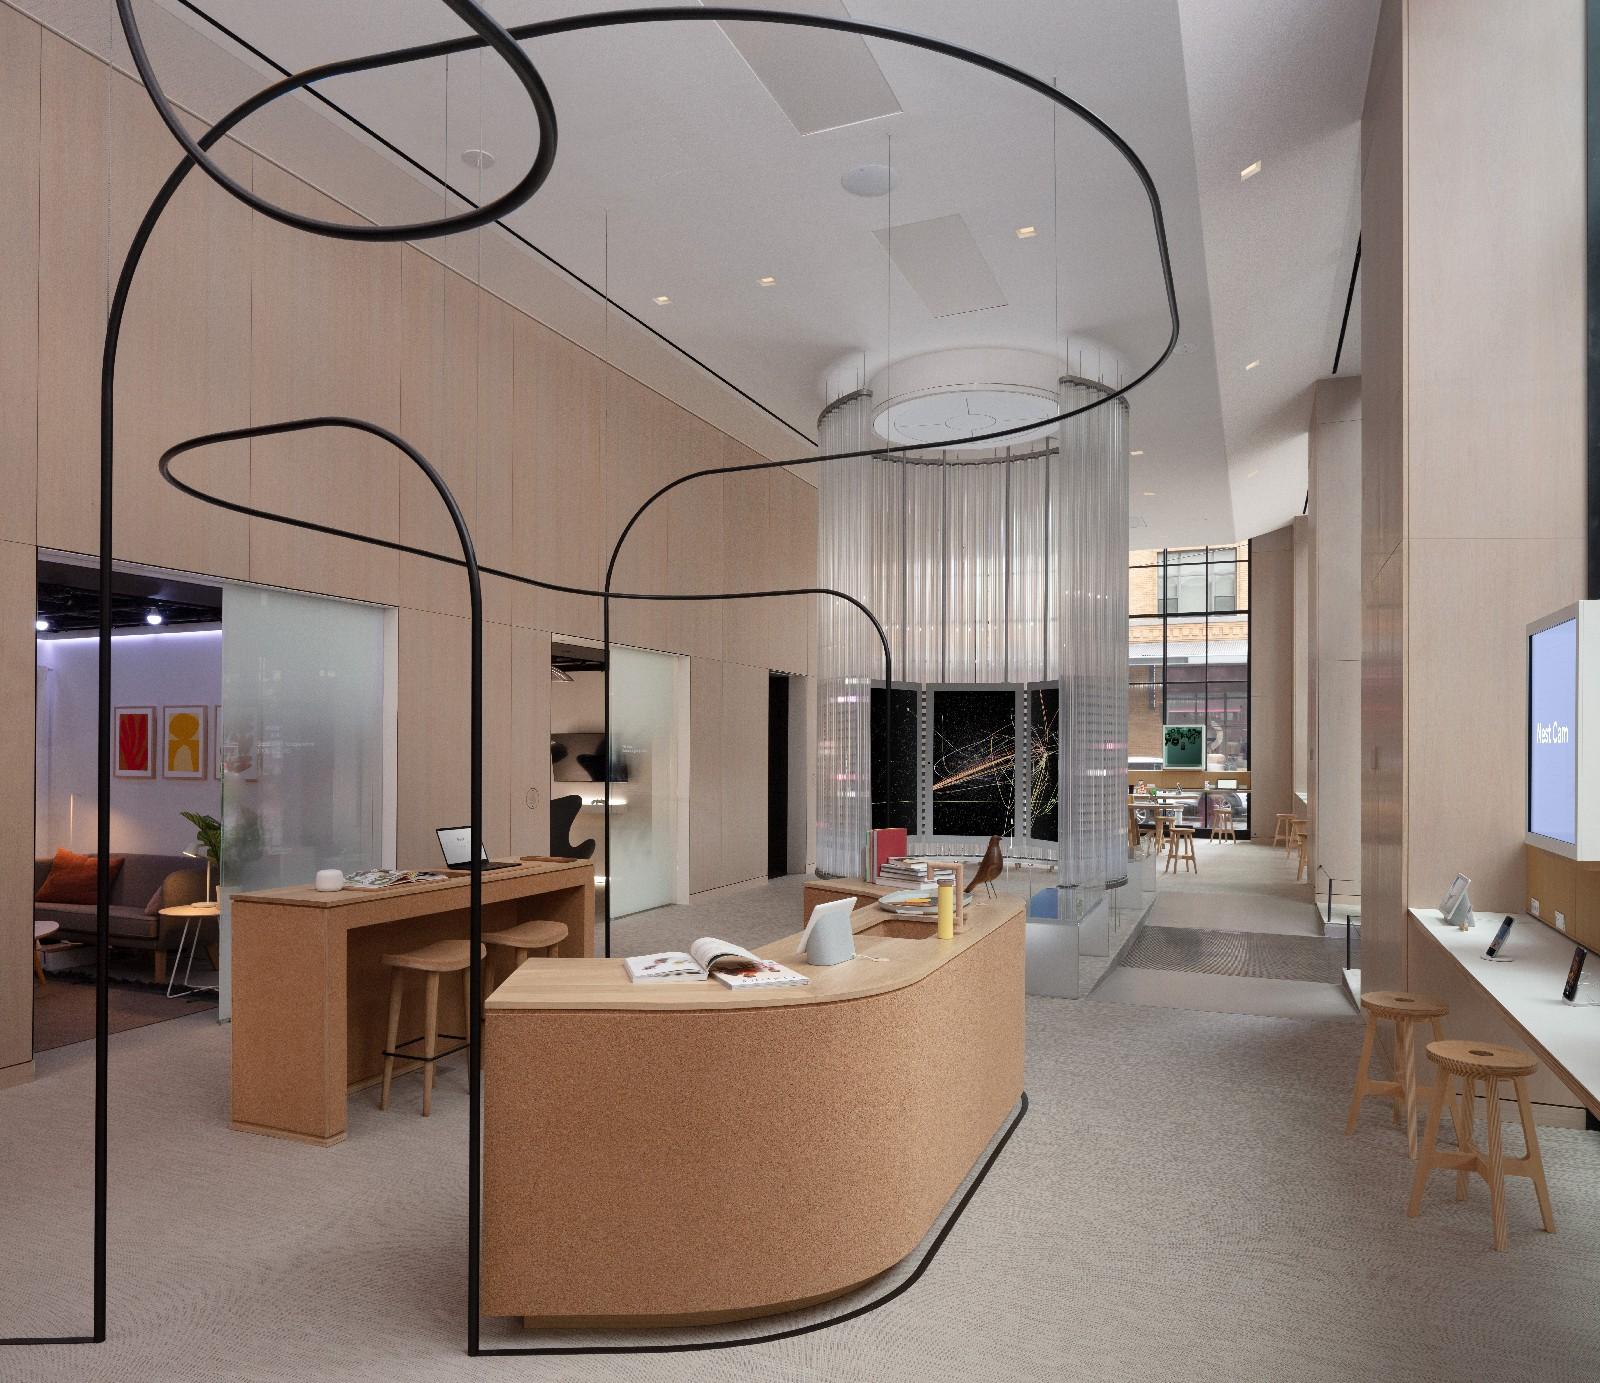 <p>Google Store Chelsea. Interior, alternate view.</p>